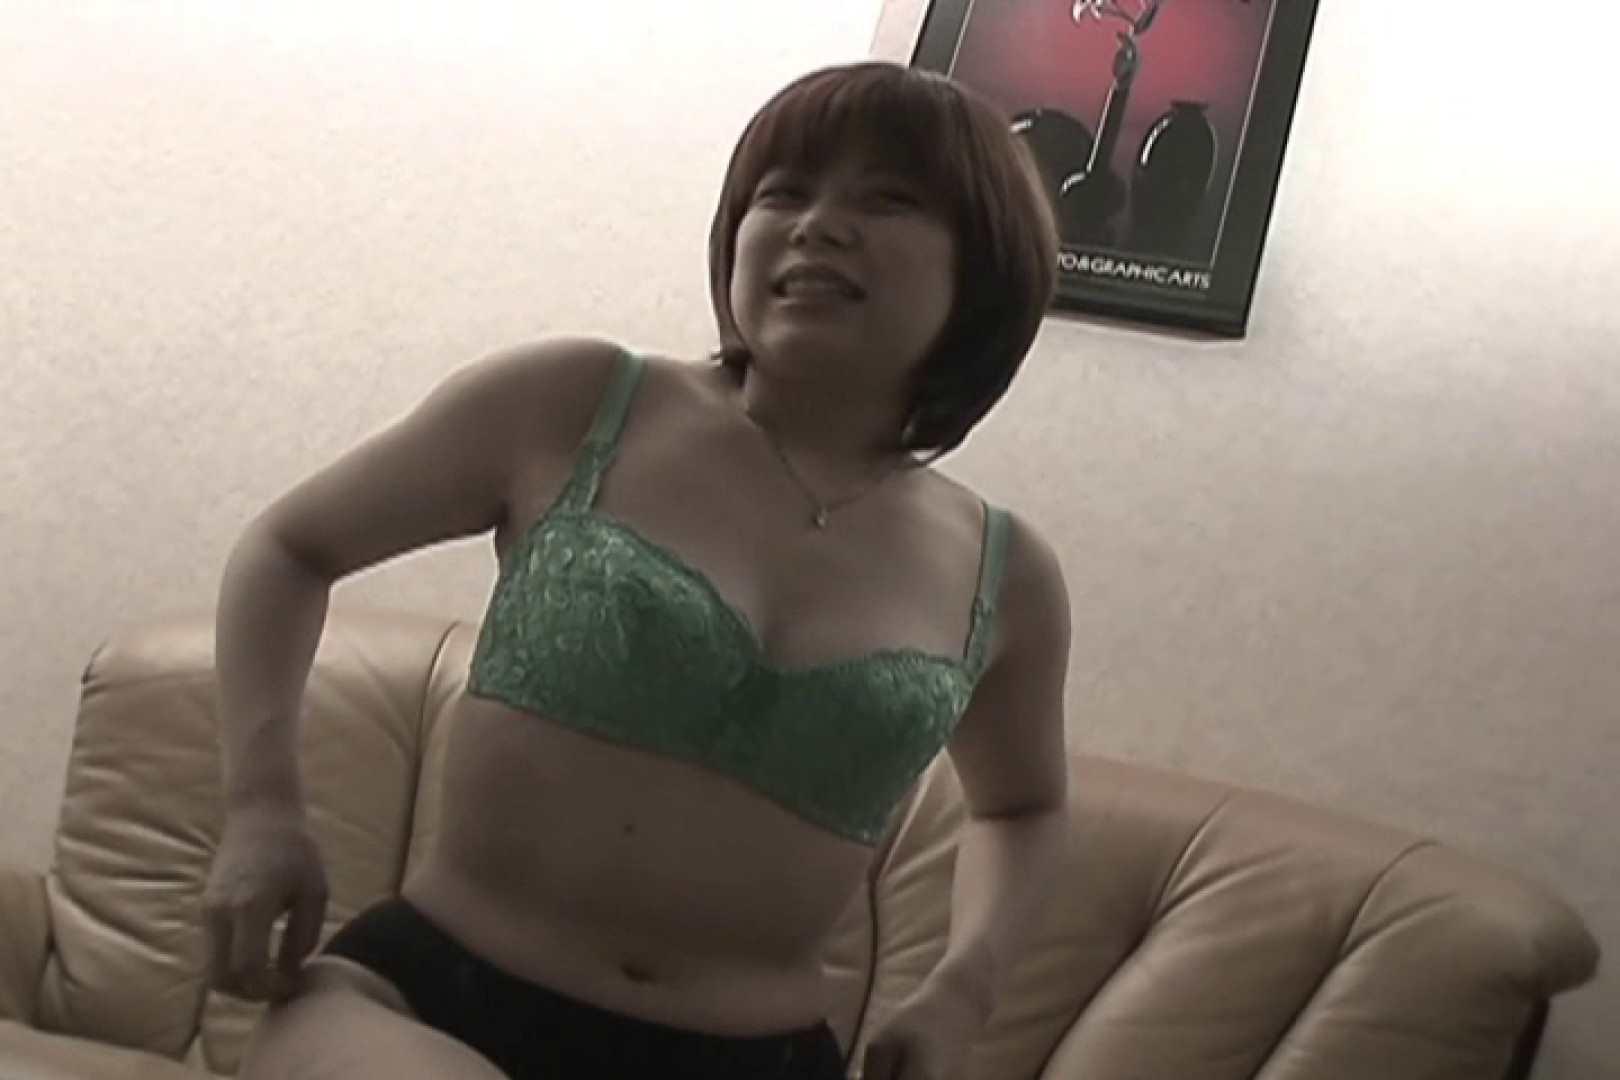 Hするために生まれてきたようなイキまくりの極エロ人妻~小池ゆり~ 熟女  92枚 48